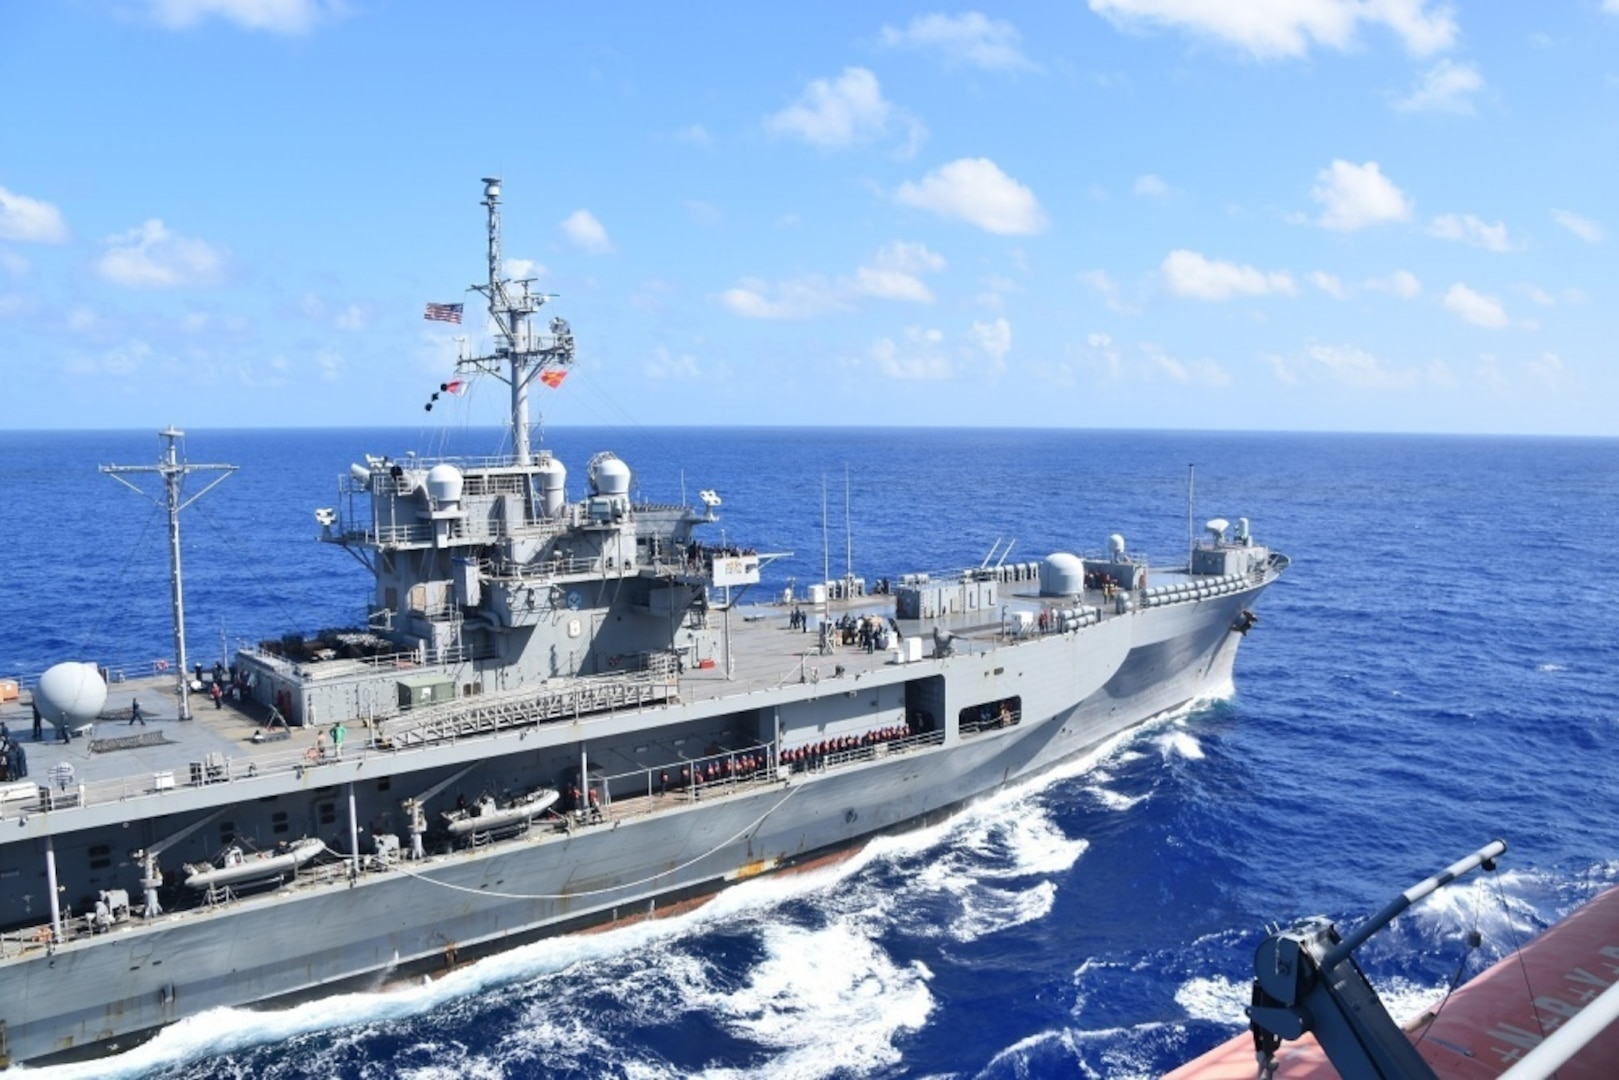 USNS Richard E. Byrd Conducts Replenishment-at-Sea with USS Blue Ridge